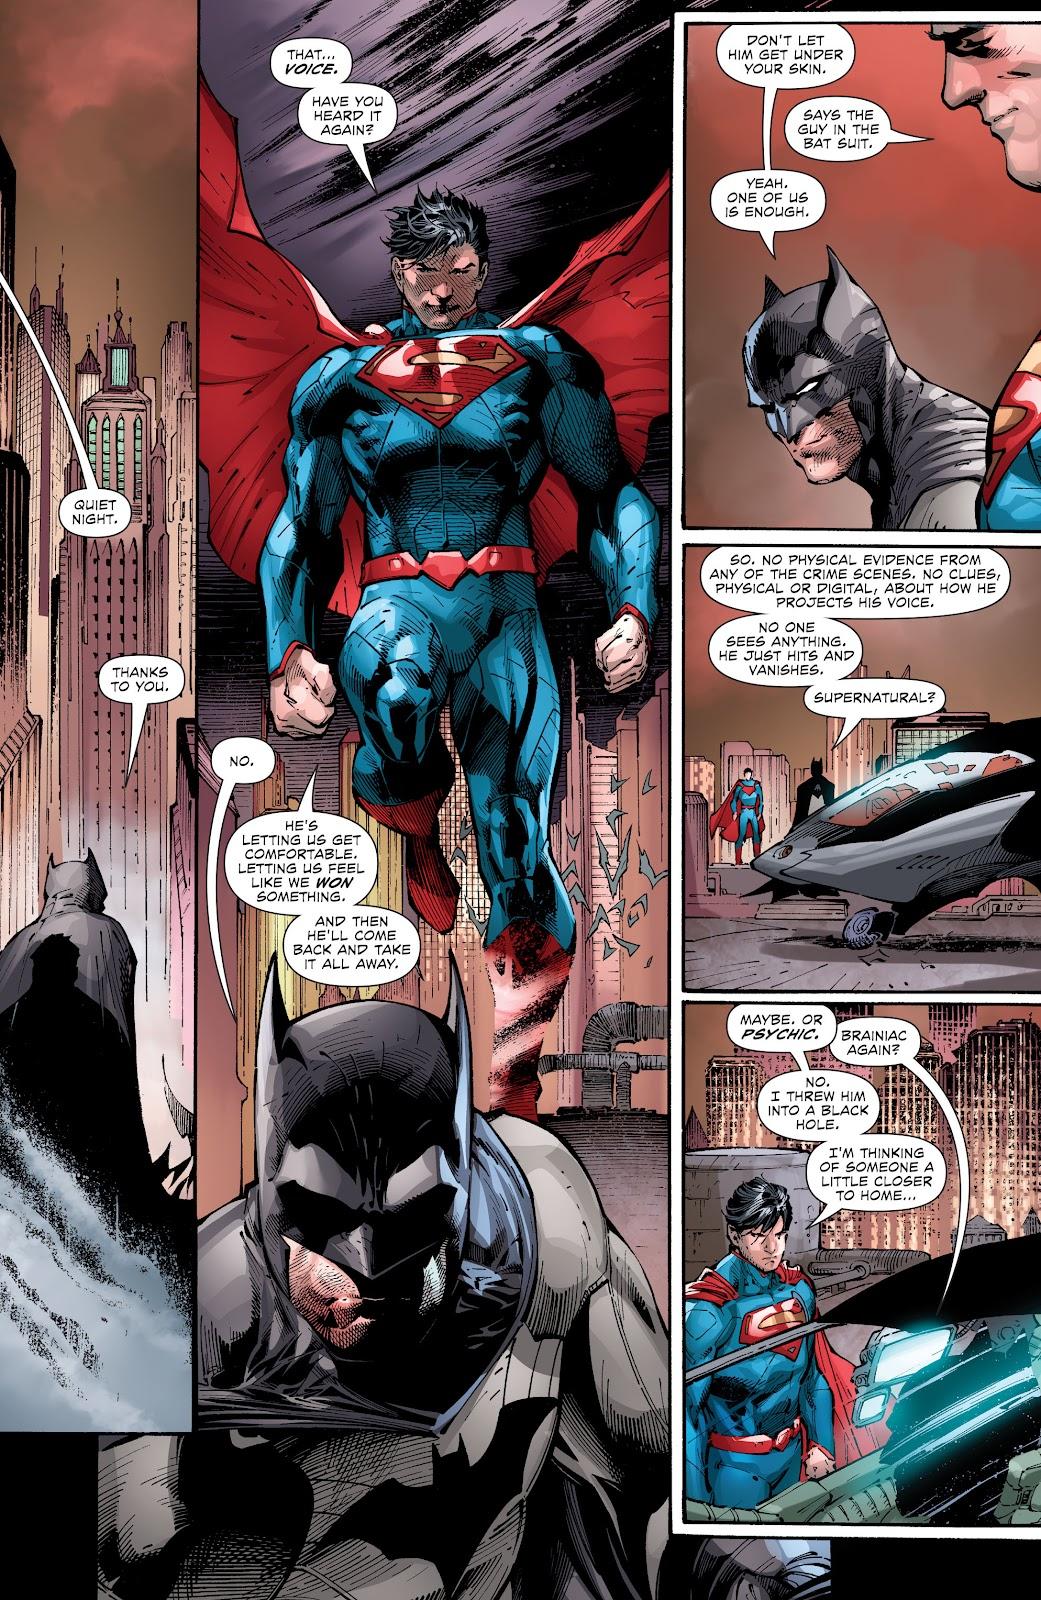 batman superman 2013 issue 17  read batman superman 2013